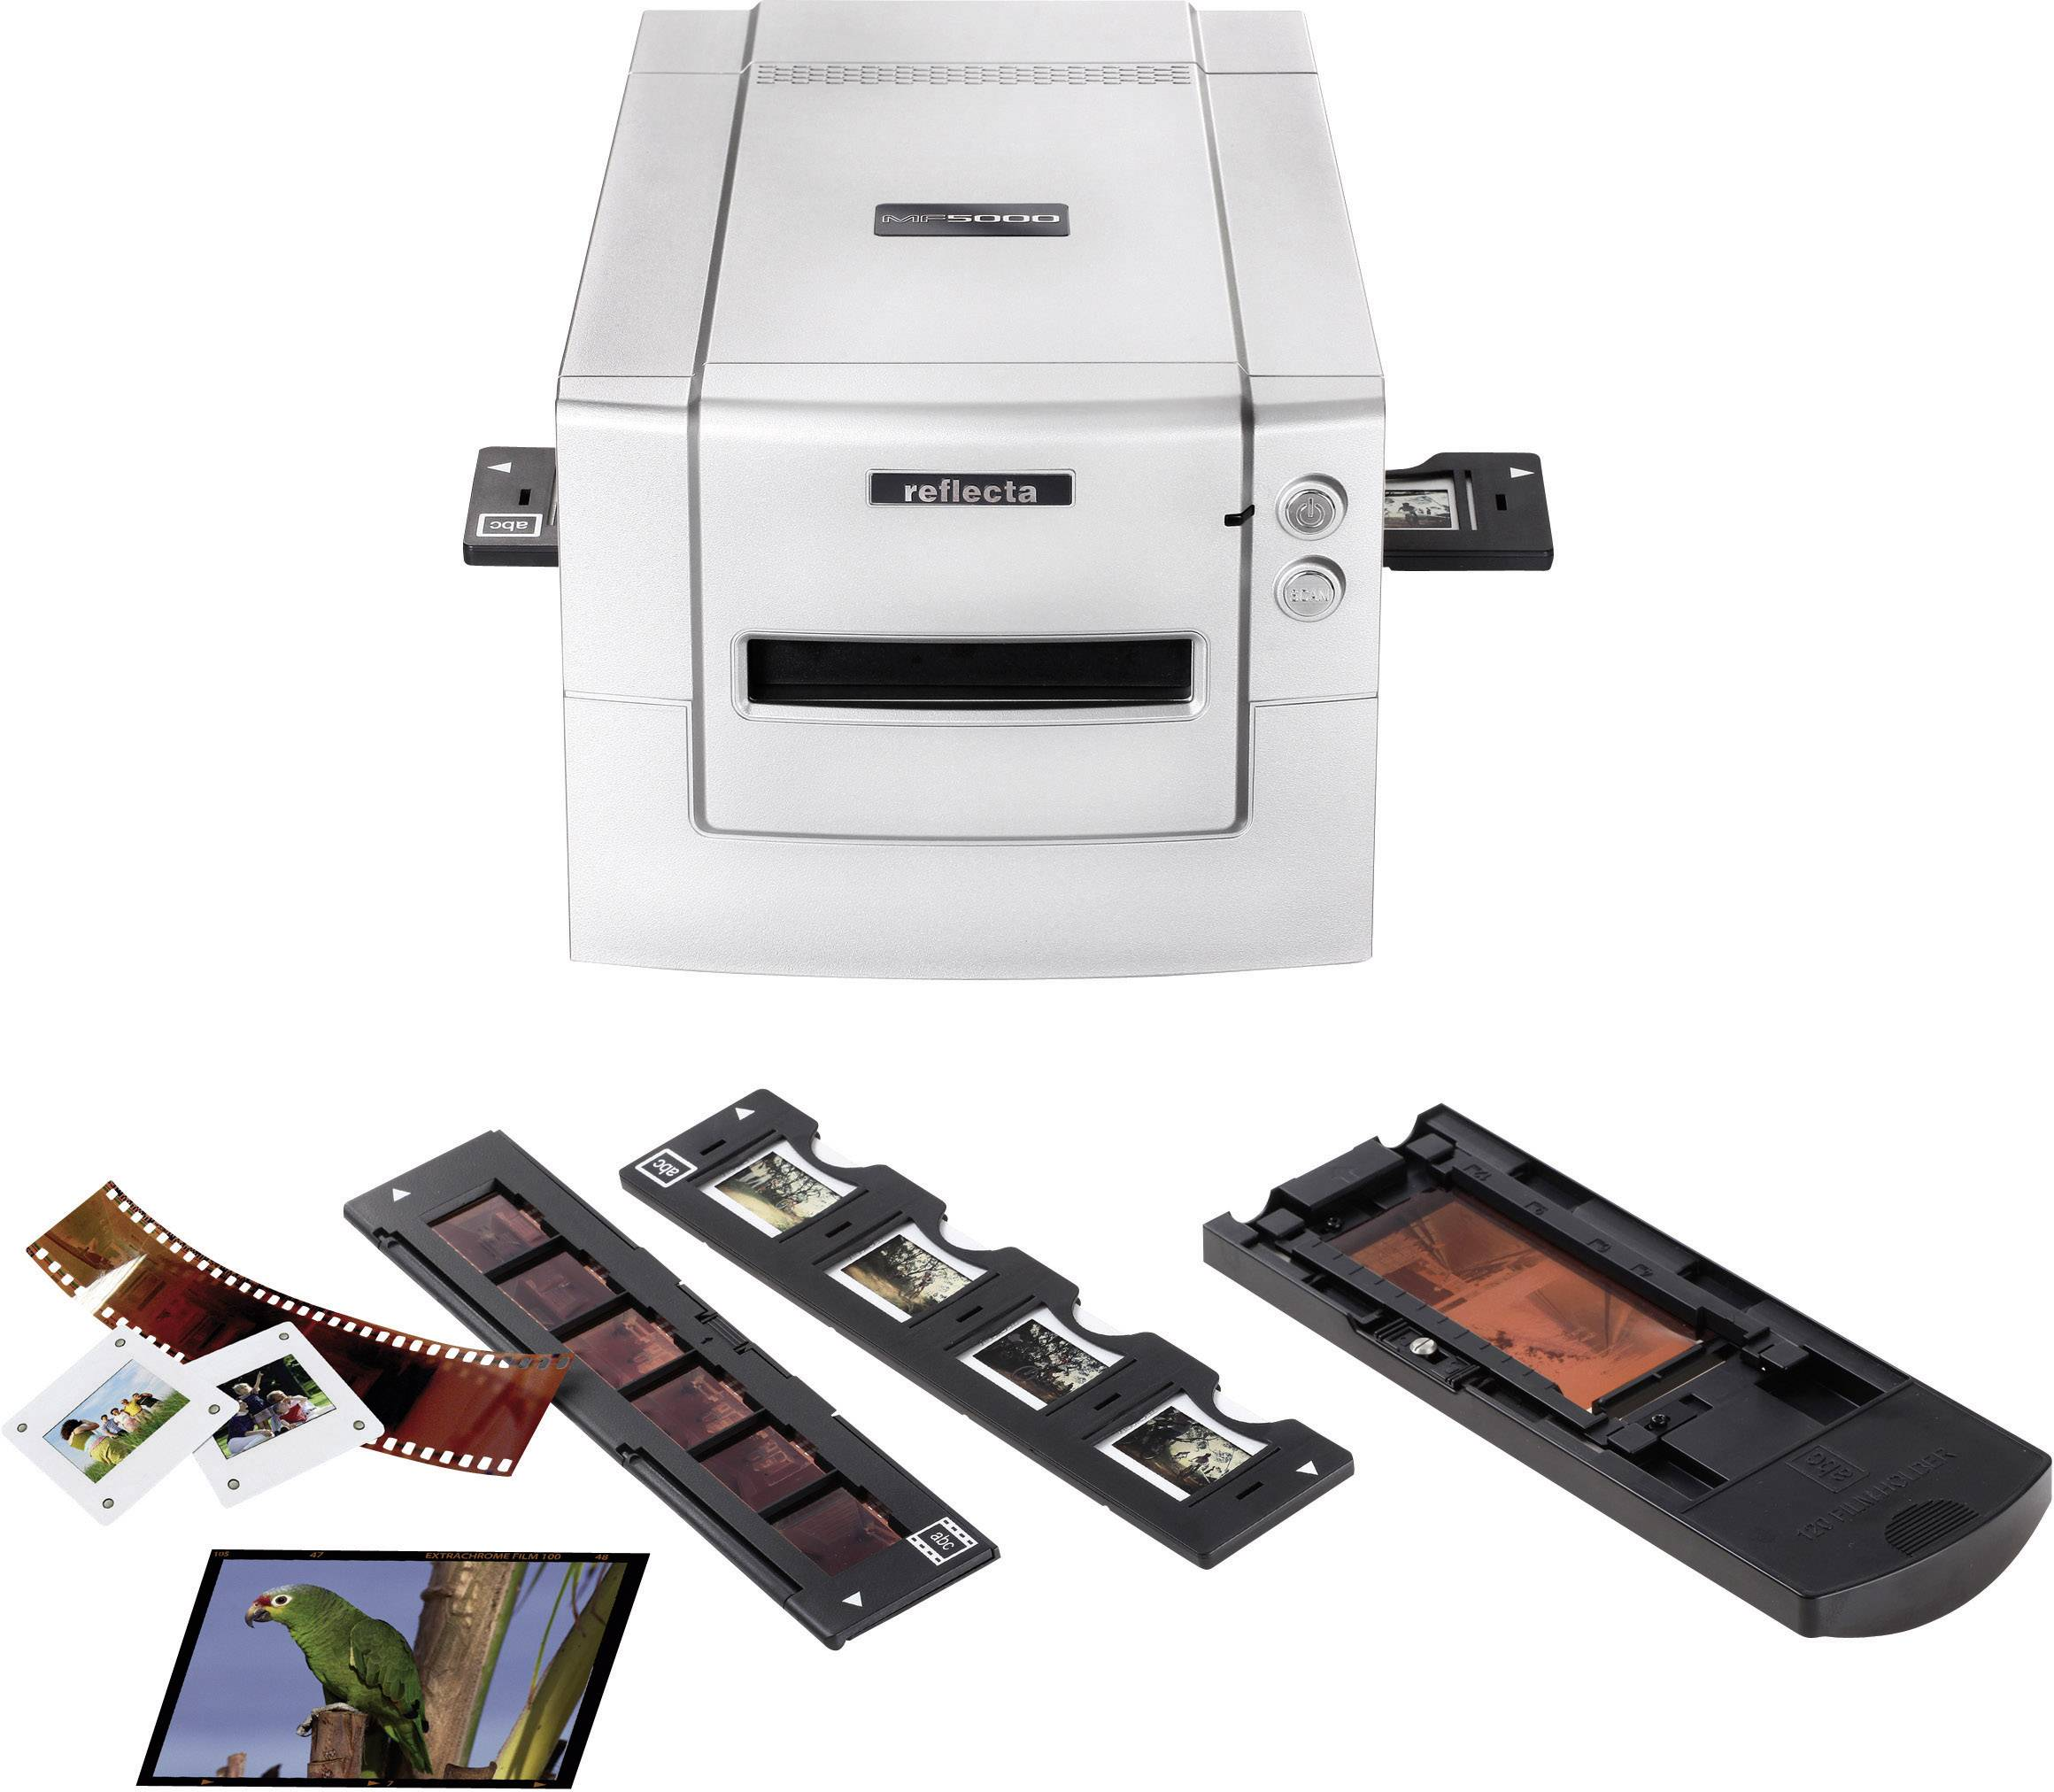 Skener diapozitívov, skener negatívov, skener fotografií, Reflecta MF 5000, N/A